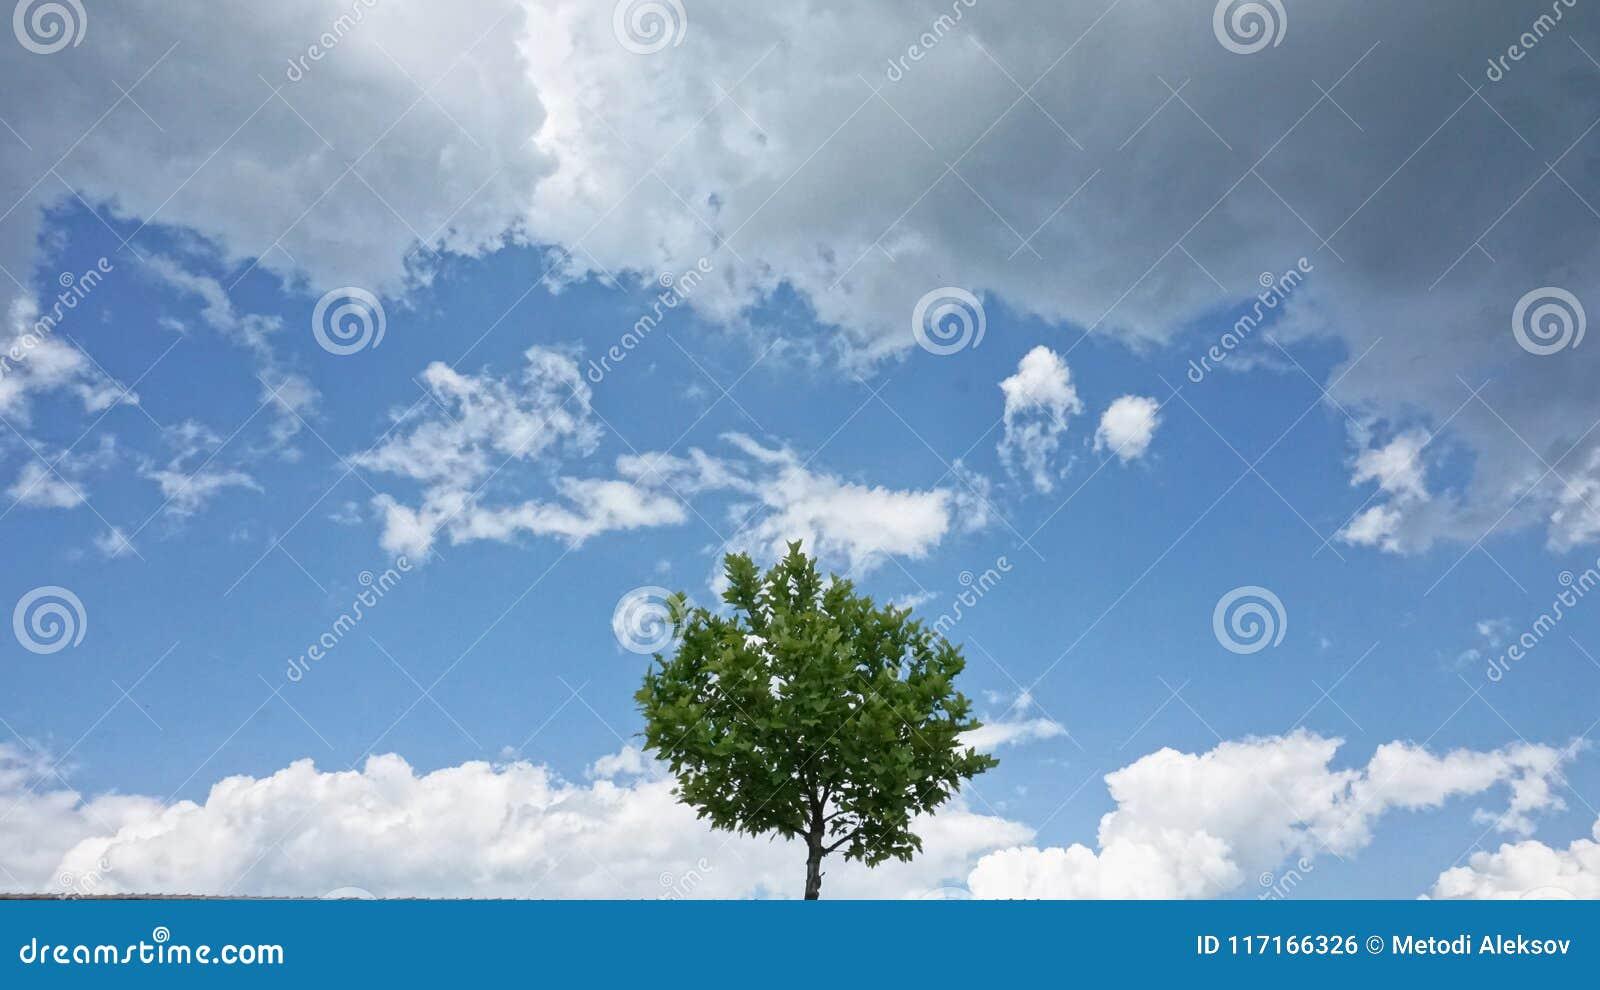 Сиротливое дерево среди облаков